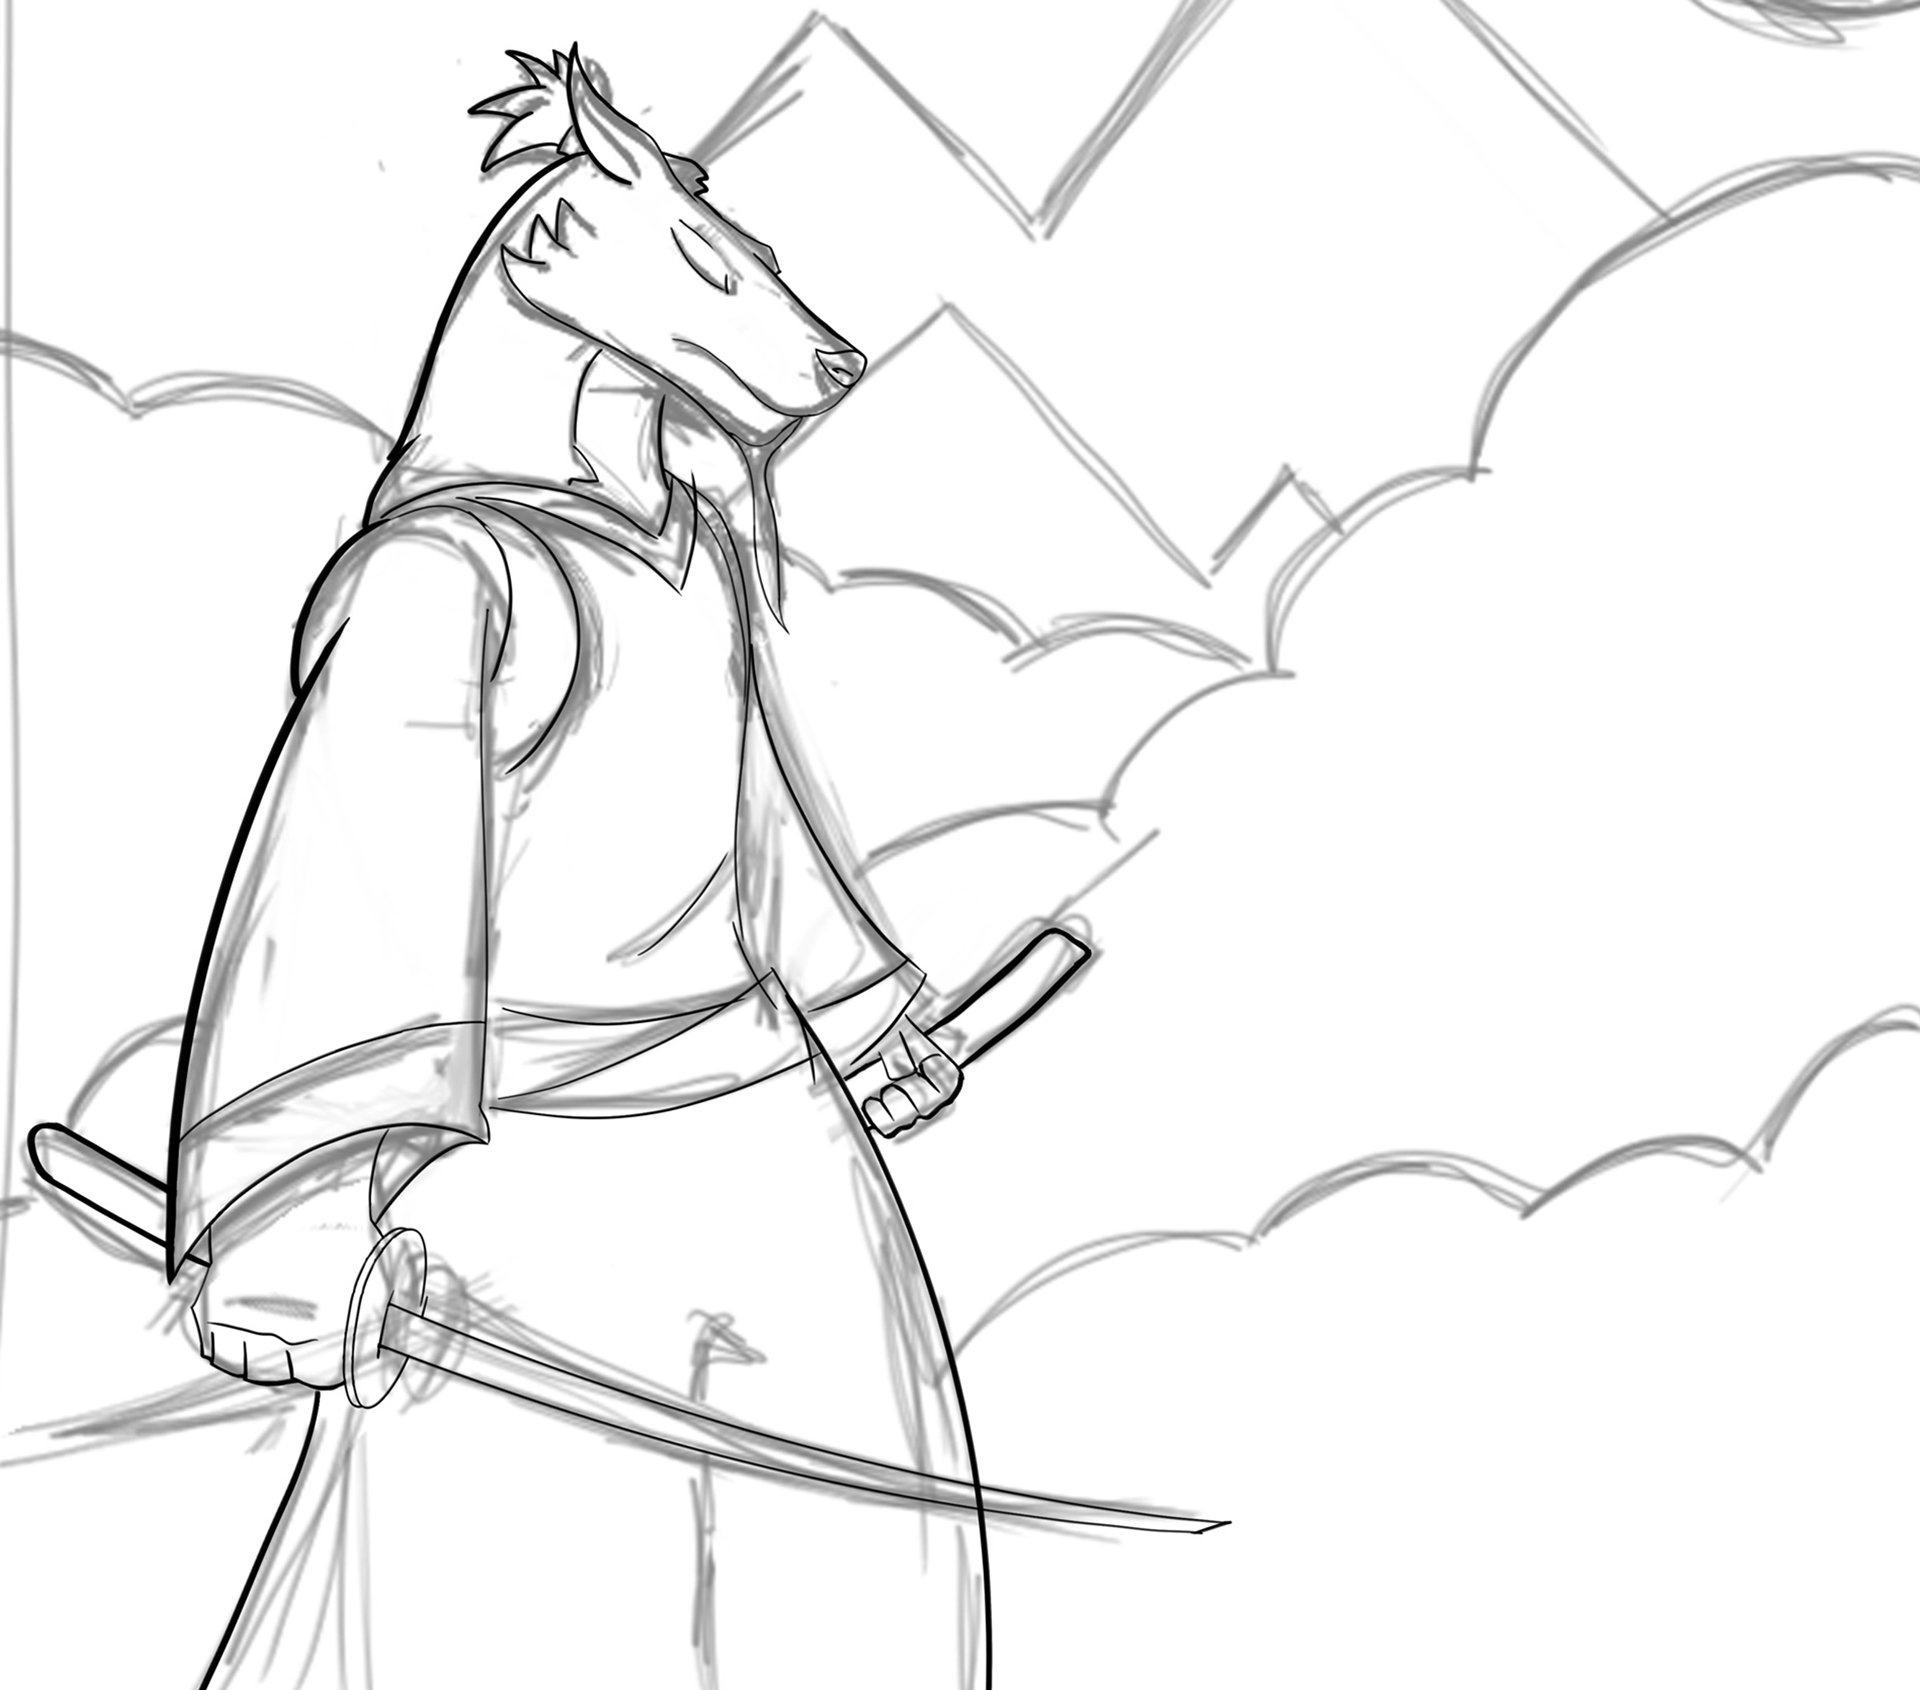 samurai-wolf-illustration-04.jpg